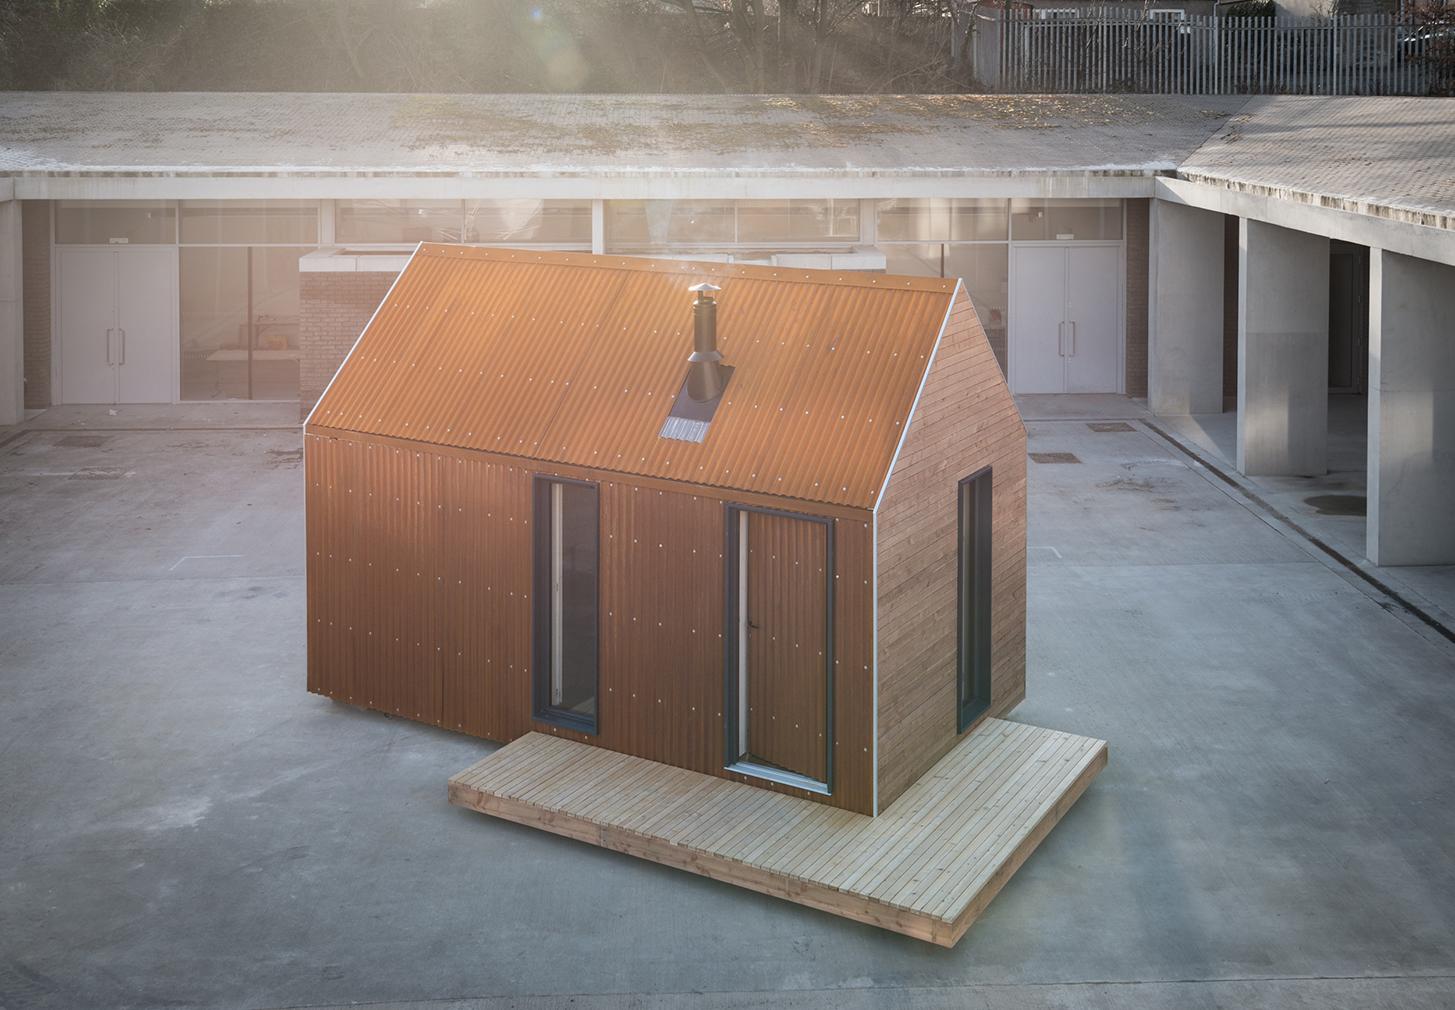 Artist Bothy prefab tiny home